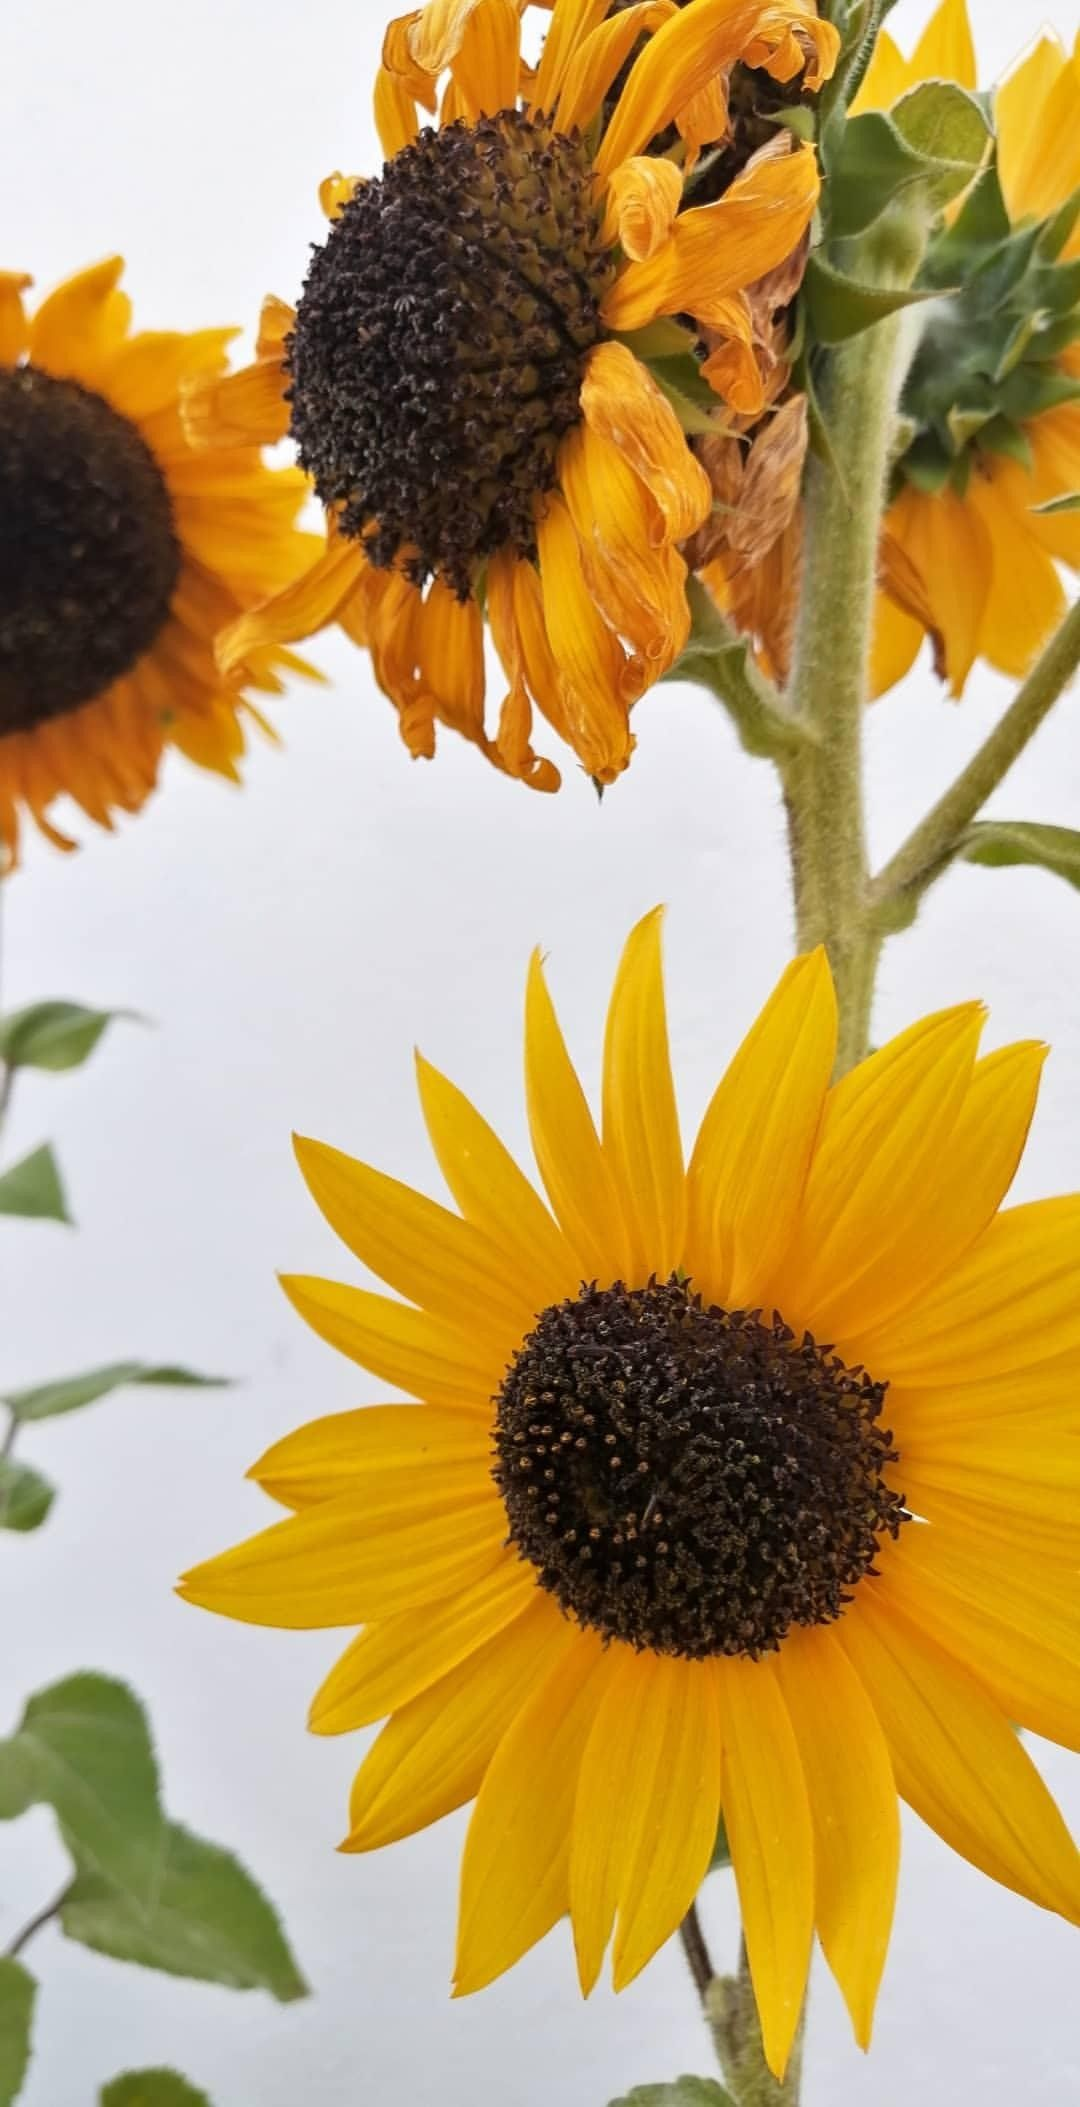 Sunflowers In 2020 Plants Sunflower Growing